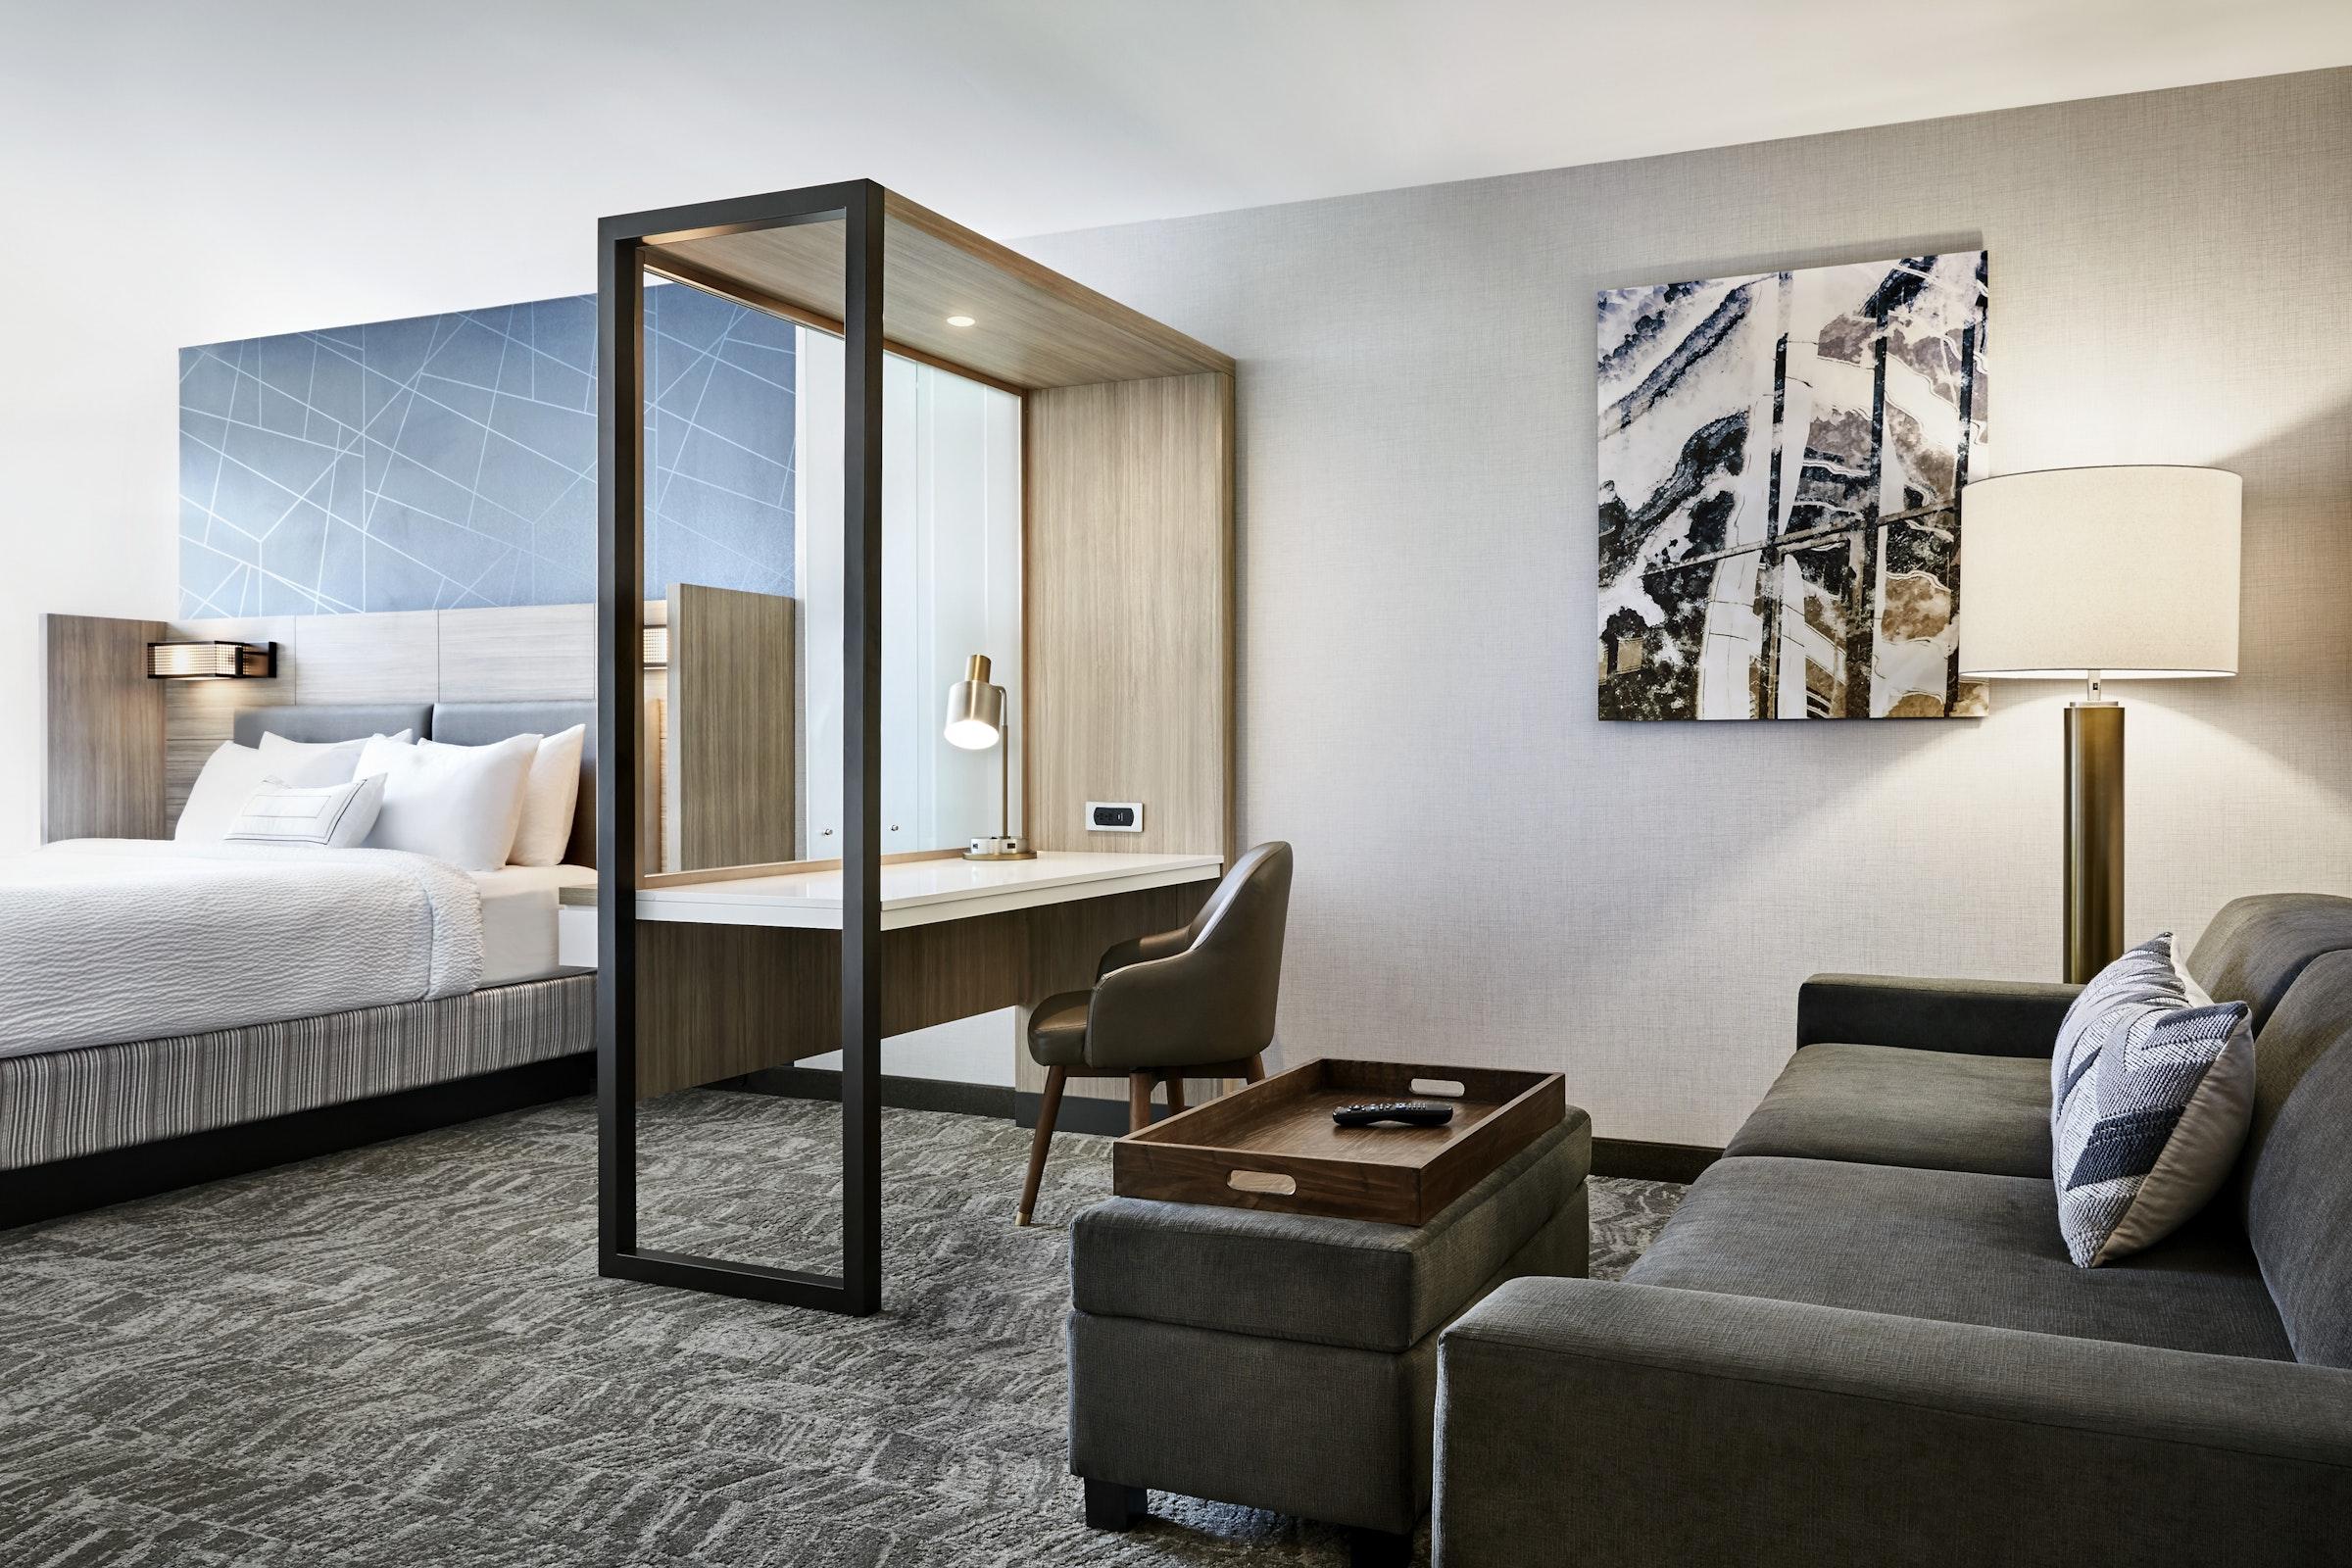 SpringHill Suites Dallas Central Expressway in Beyond Dallas